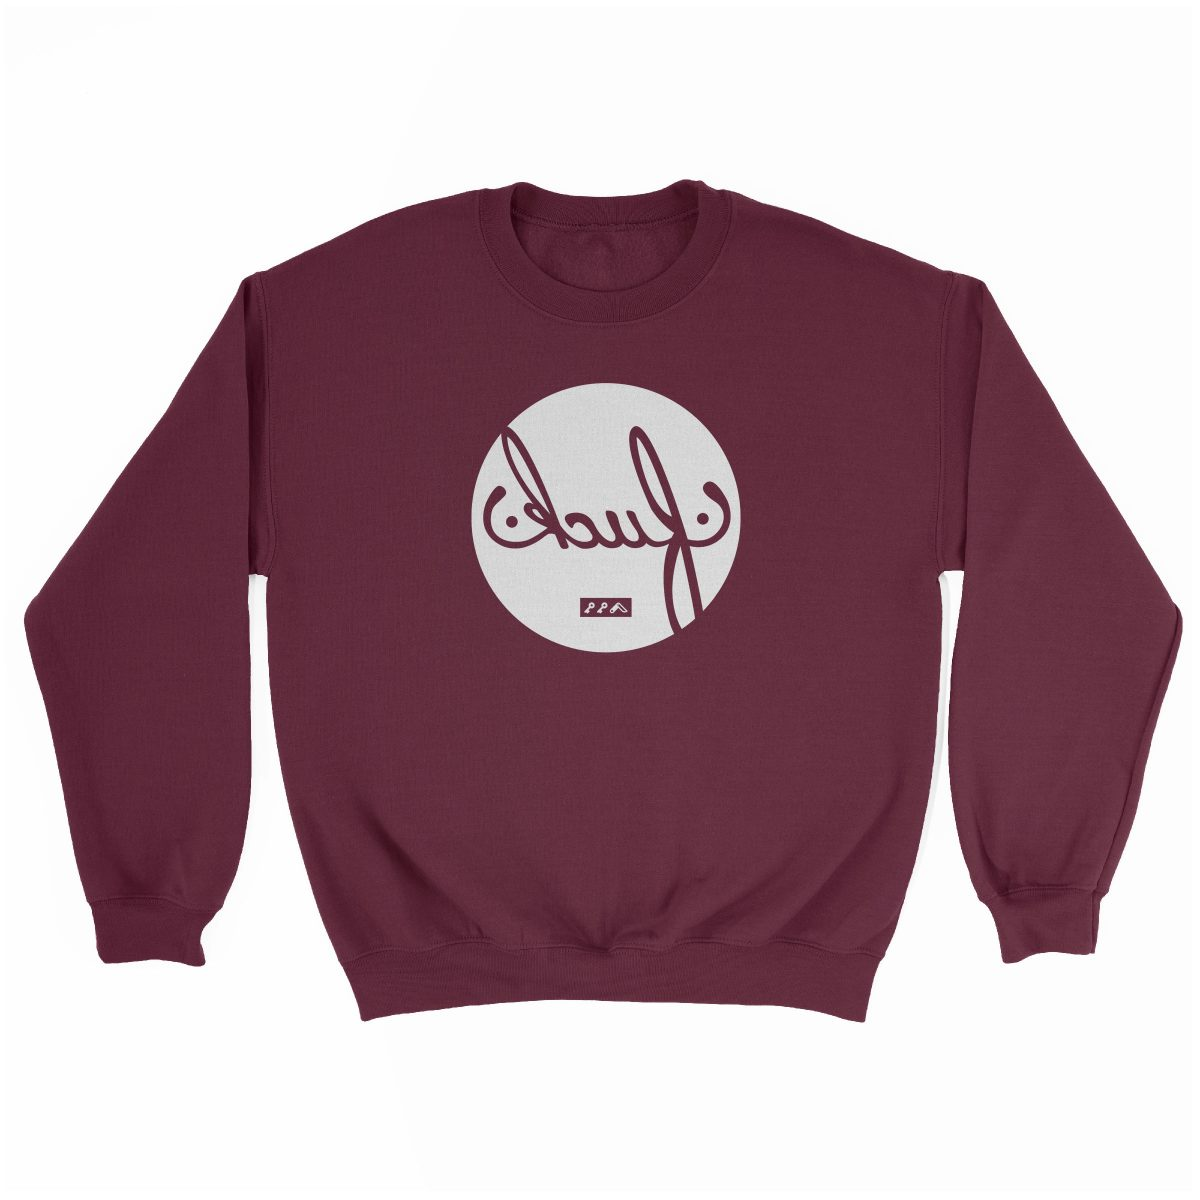 i give zero fucks sweatshirt maroon at kikicutt.com